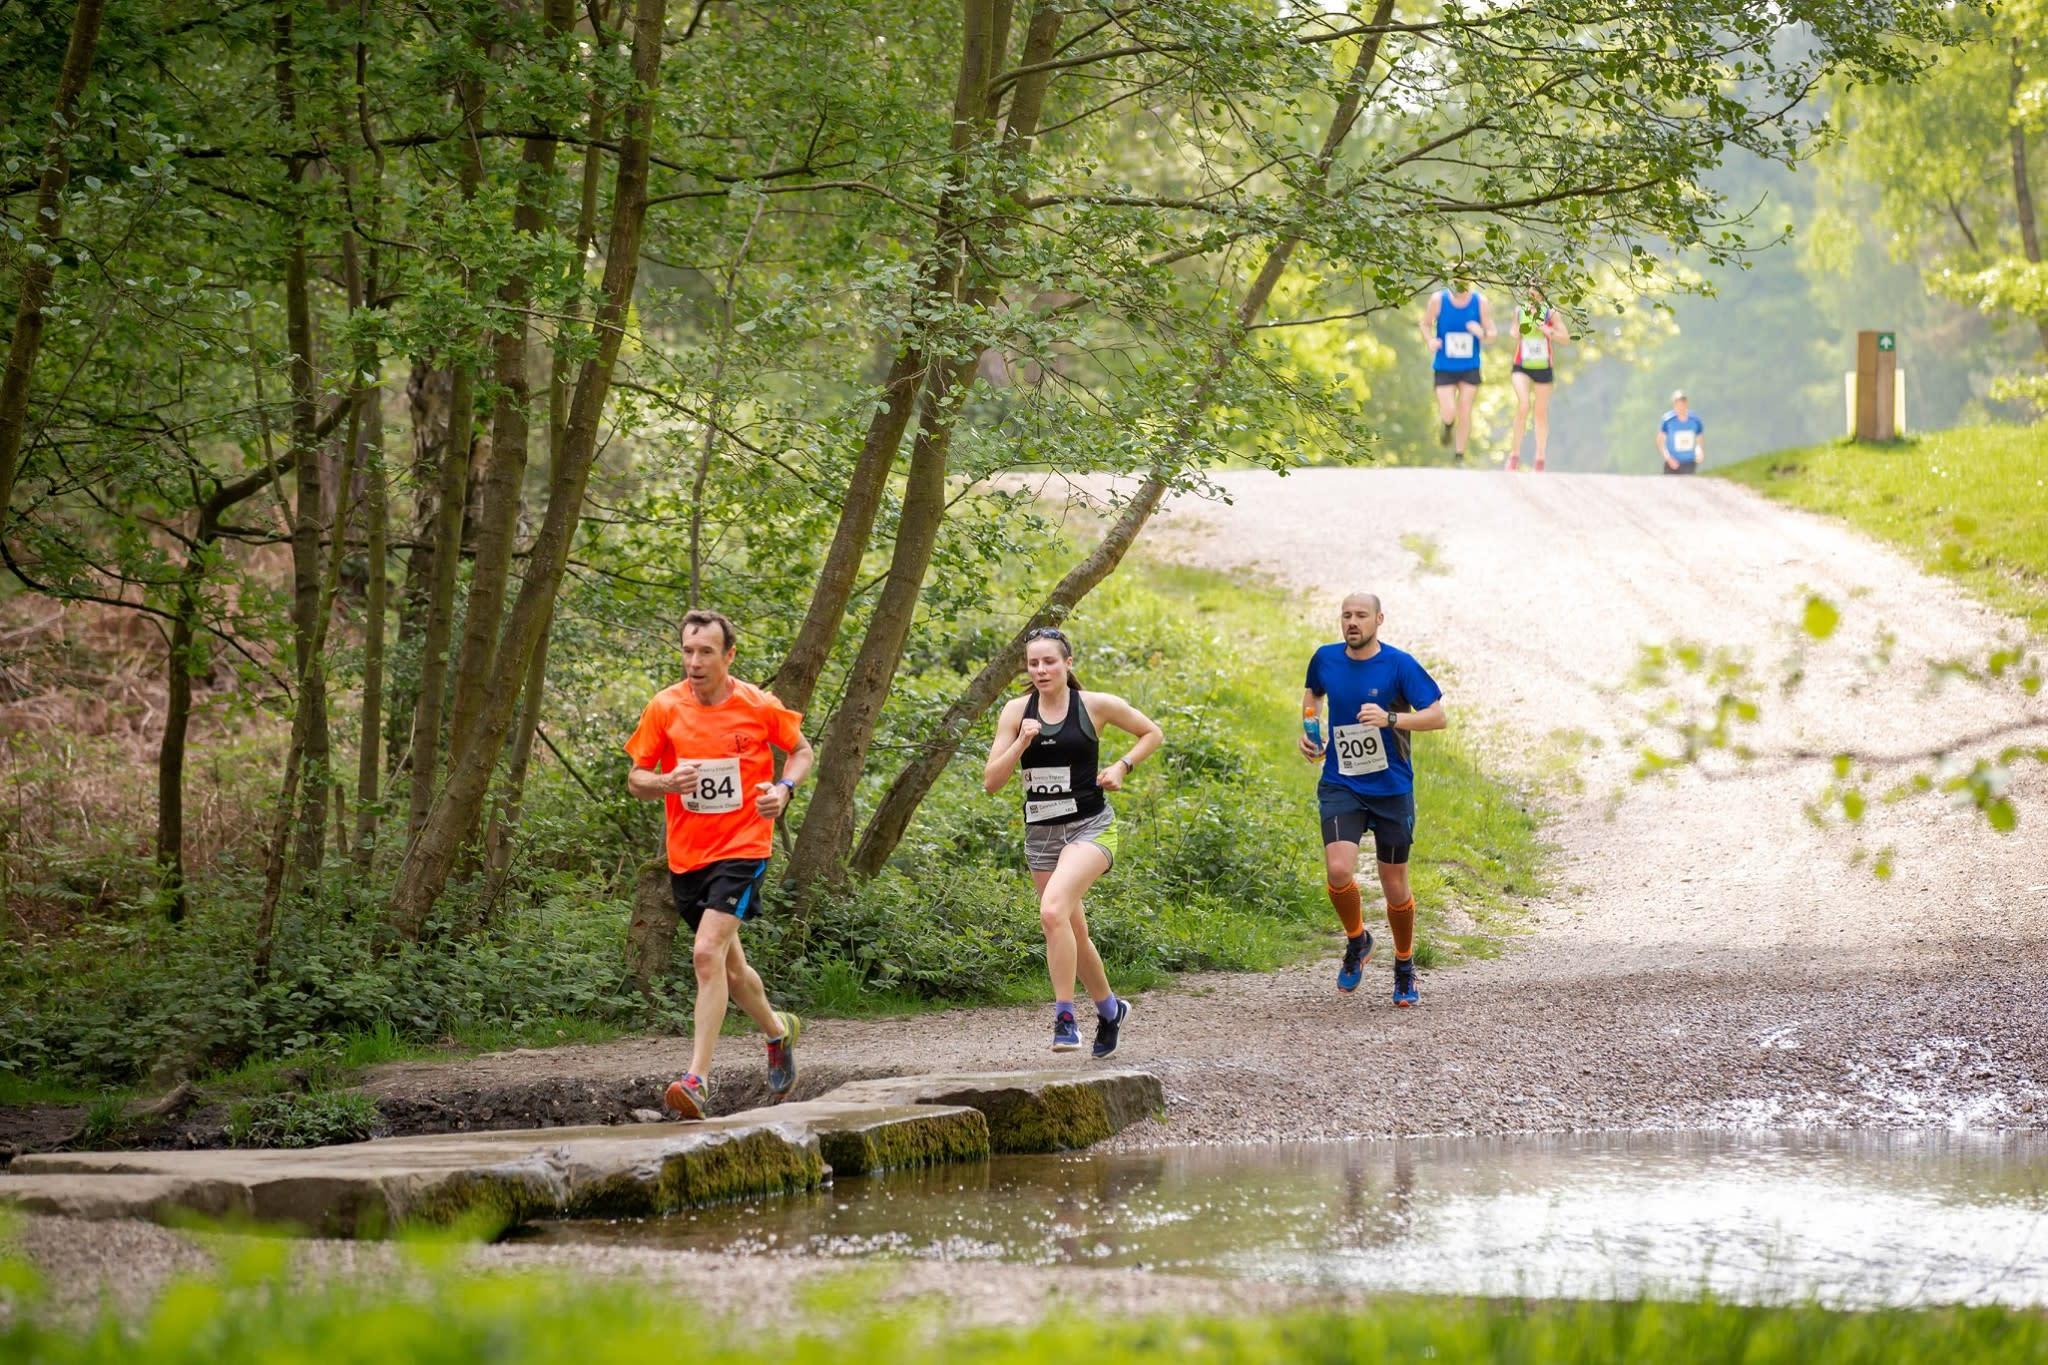 The Cannock Chase Half Marathon & 10k